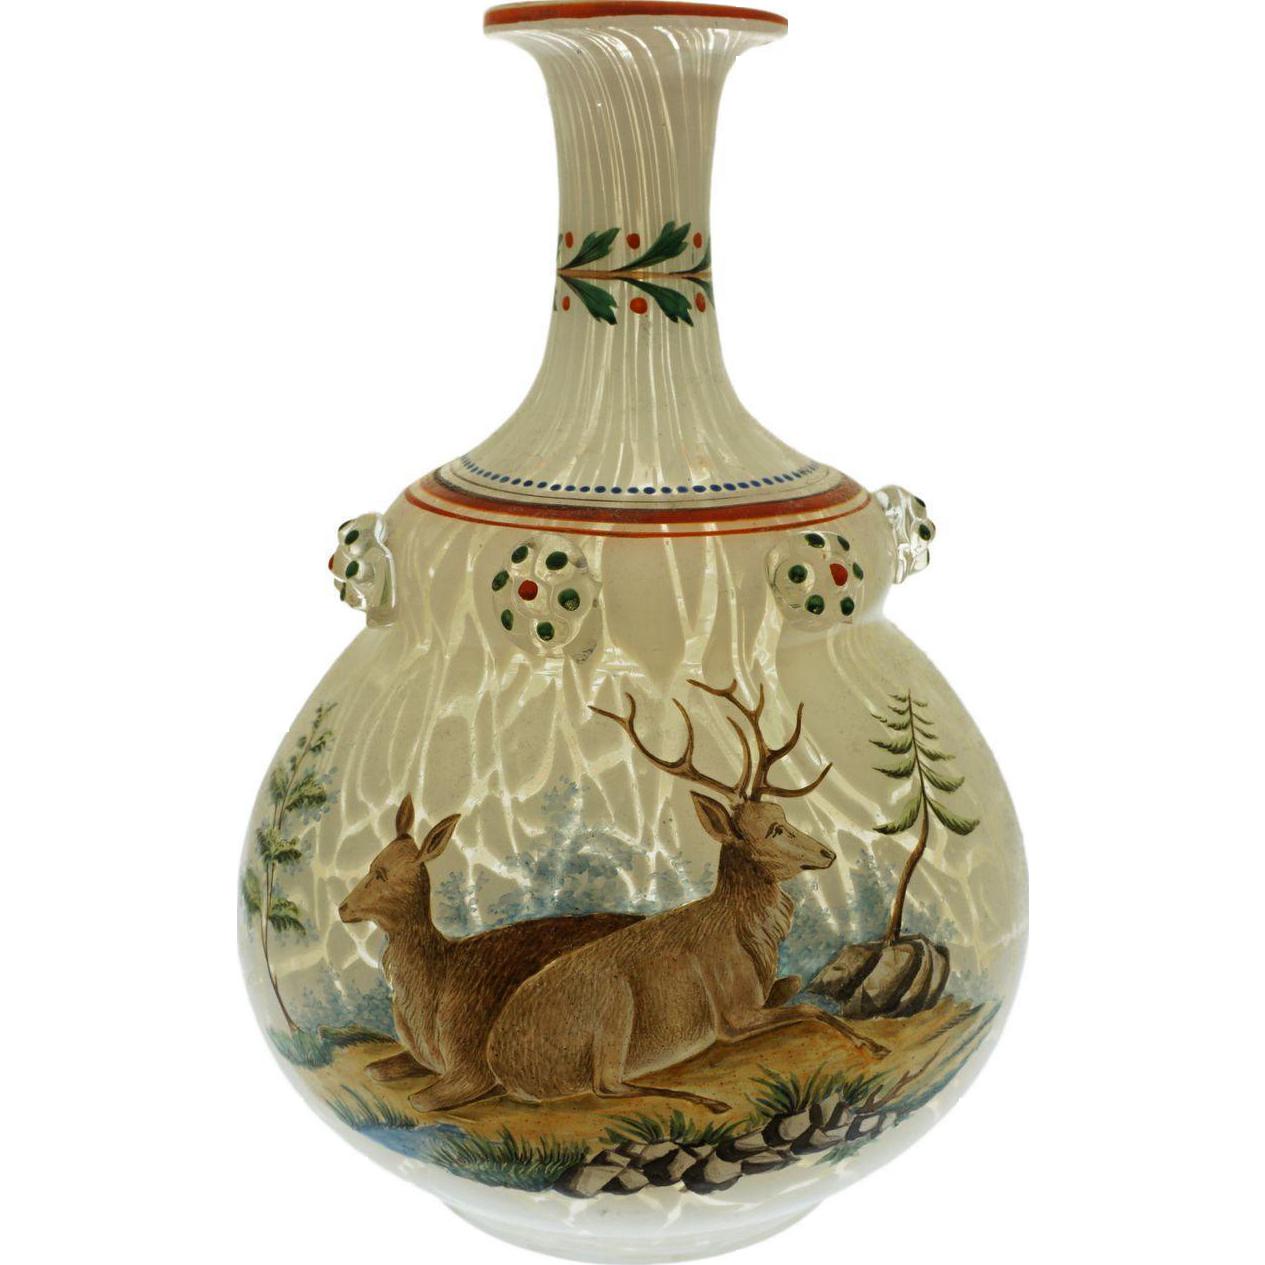 Antique Bohemian Hunt Scene Enamel Marbled Glass Prunt Flask Bottle Double Gourd Harrach - circa 1862, Bohemia